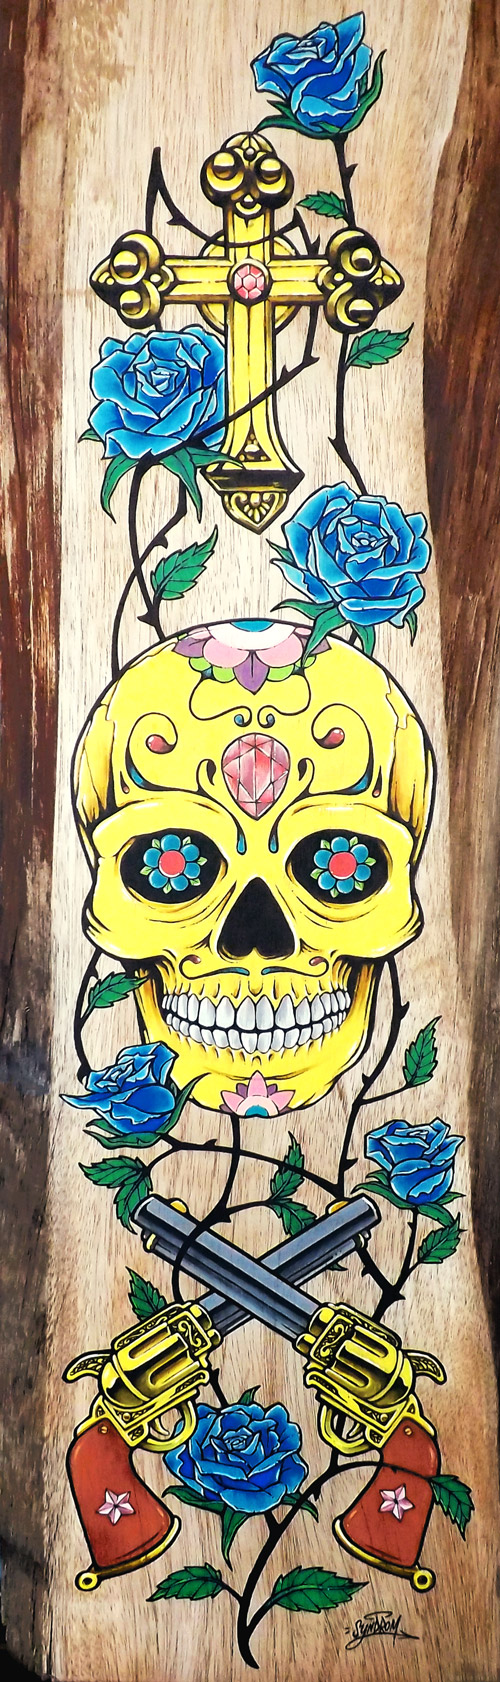 Sugar Skull - Peinture sur bois